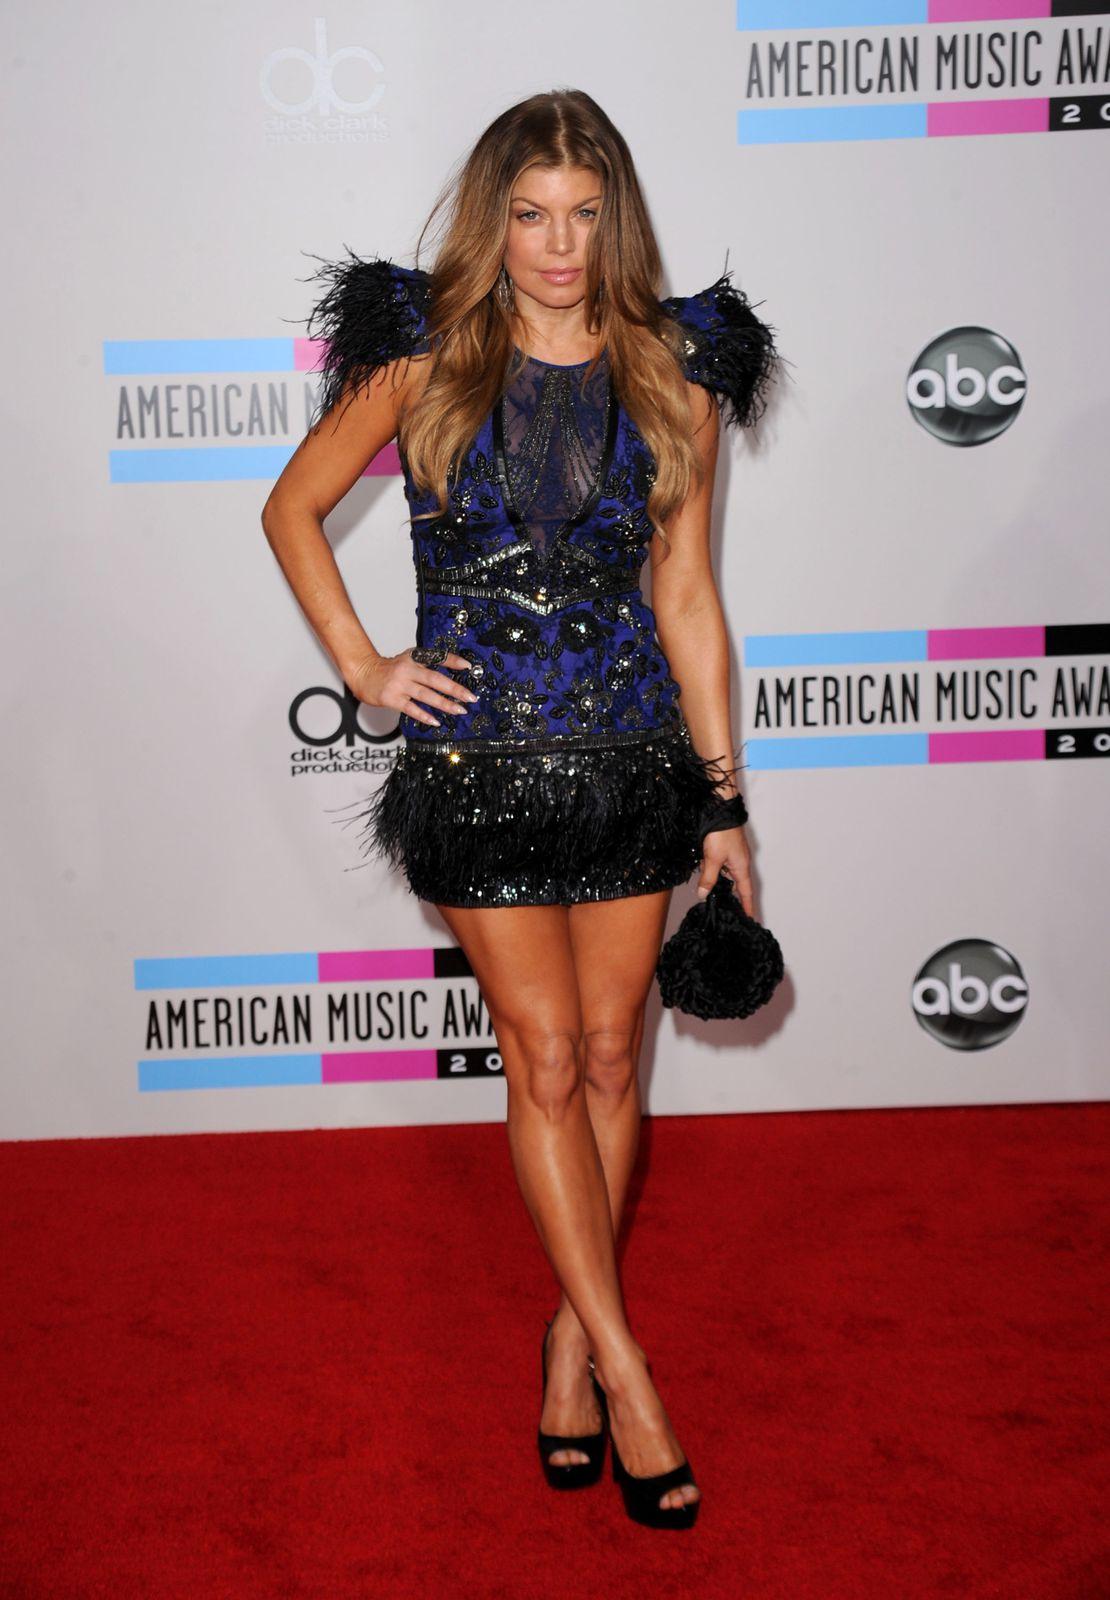 Fergie---Shane-Peacock--Falgunie---American-Music-Award---F.jpg